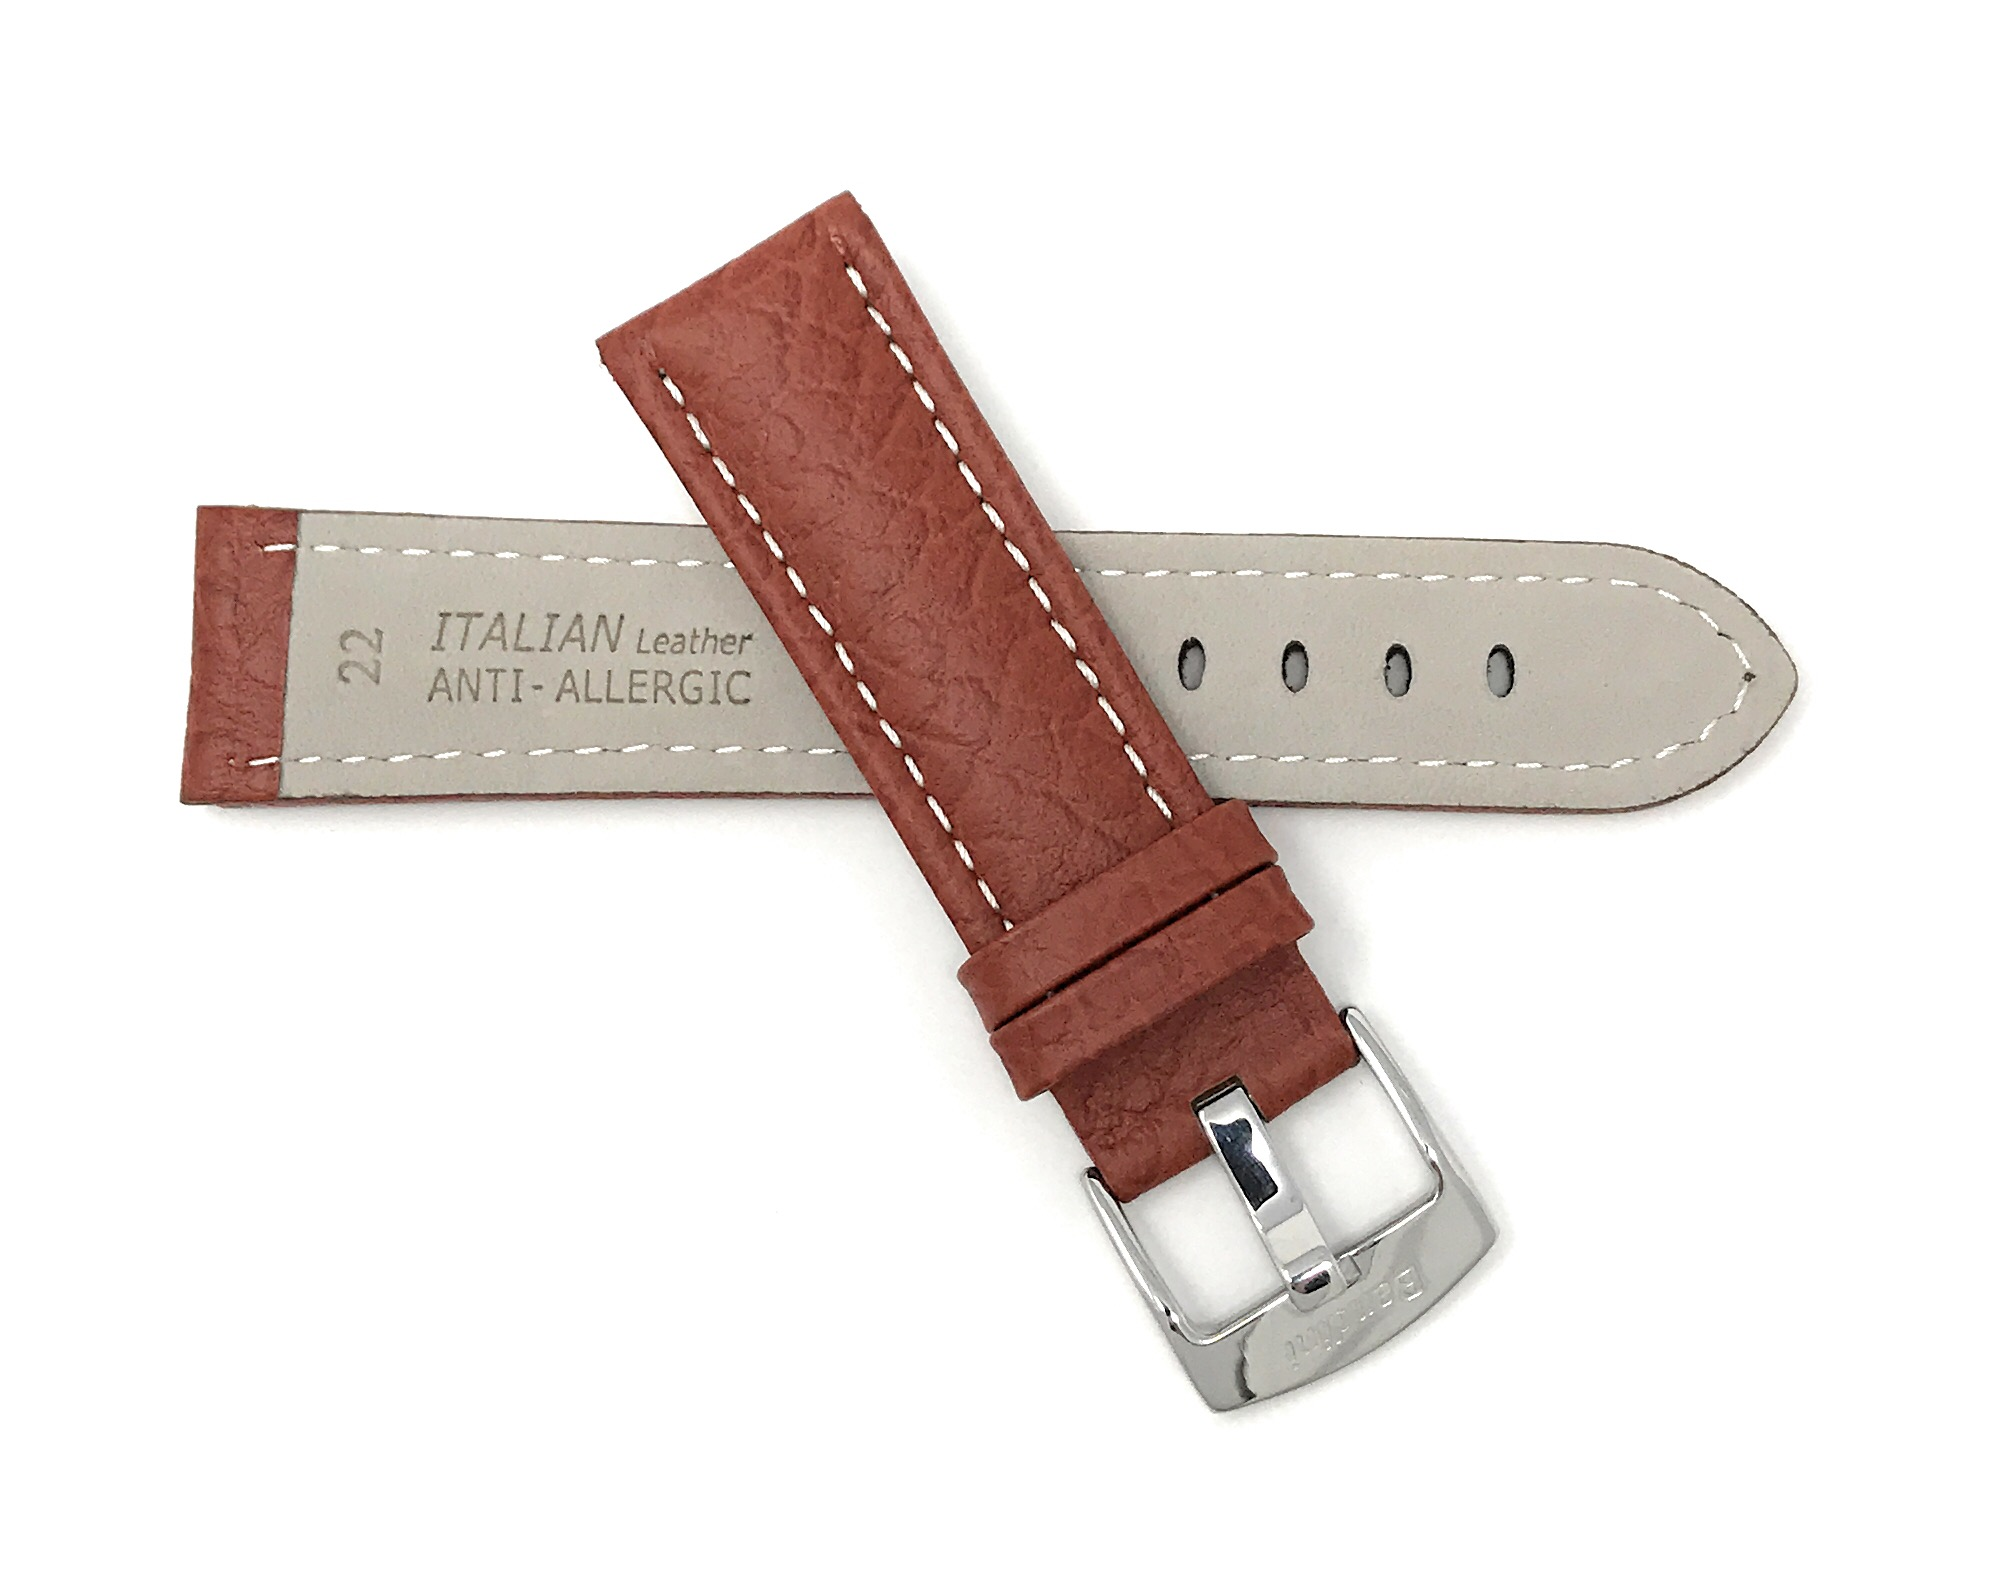 Bandini-Watch-Band-Leather-Strap-Buffalo-Pattern-18mm-30mm-Extra-Long-Also thumbnail 24